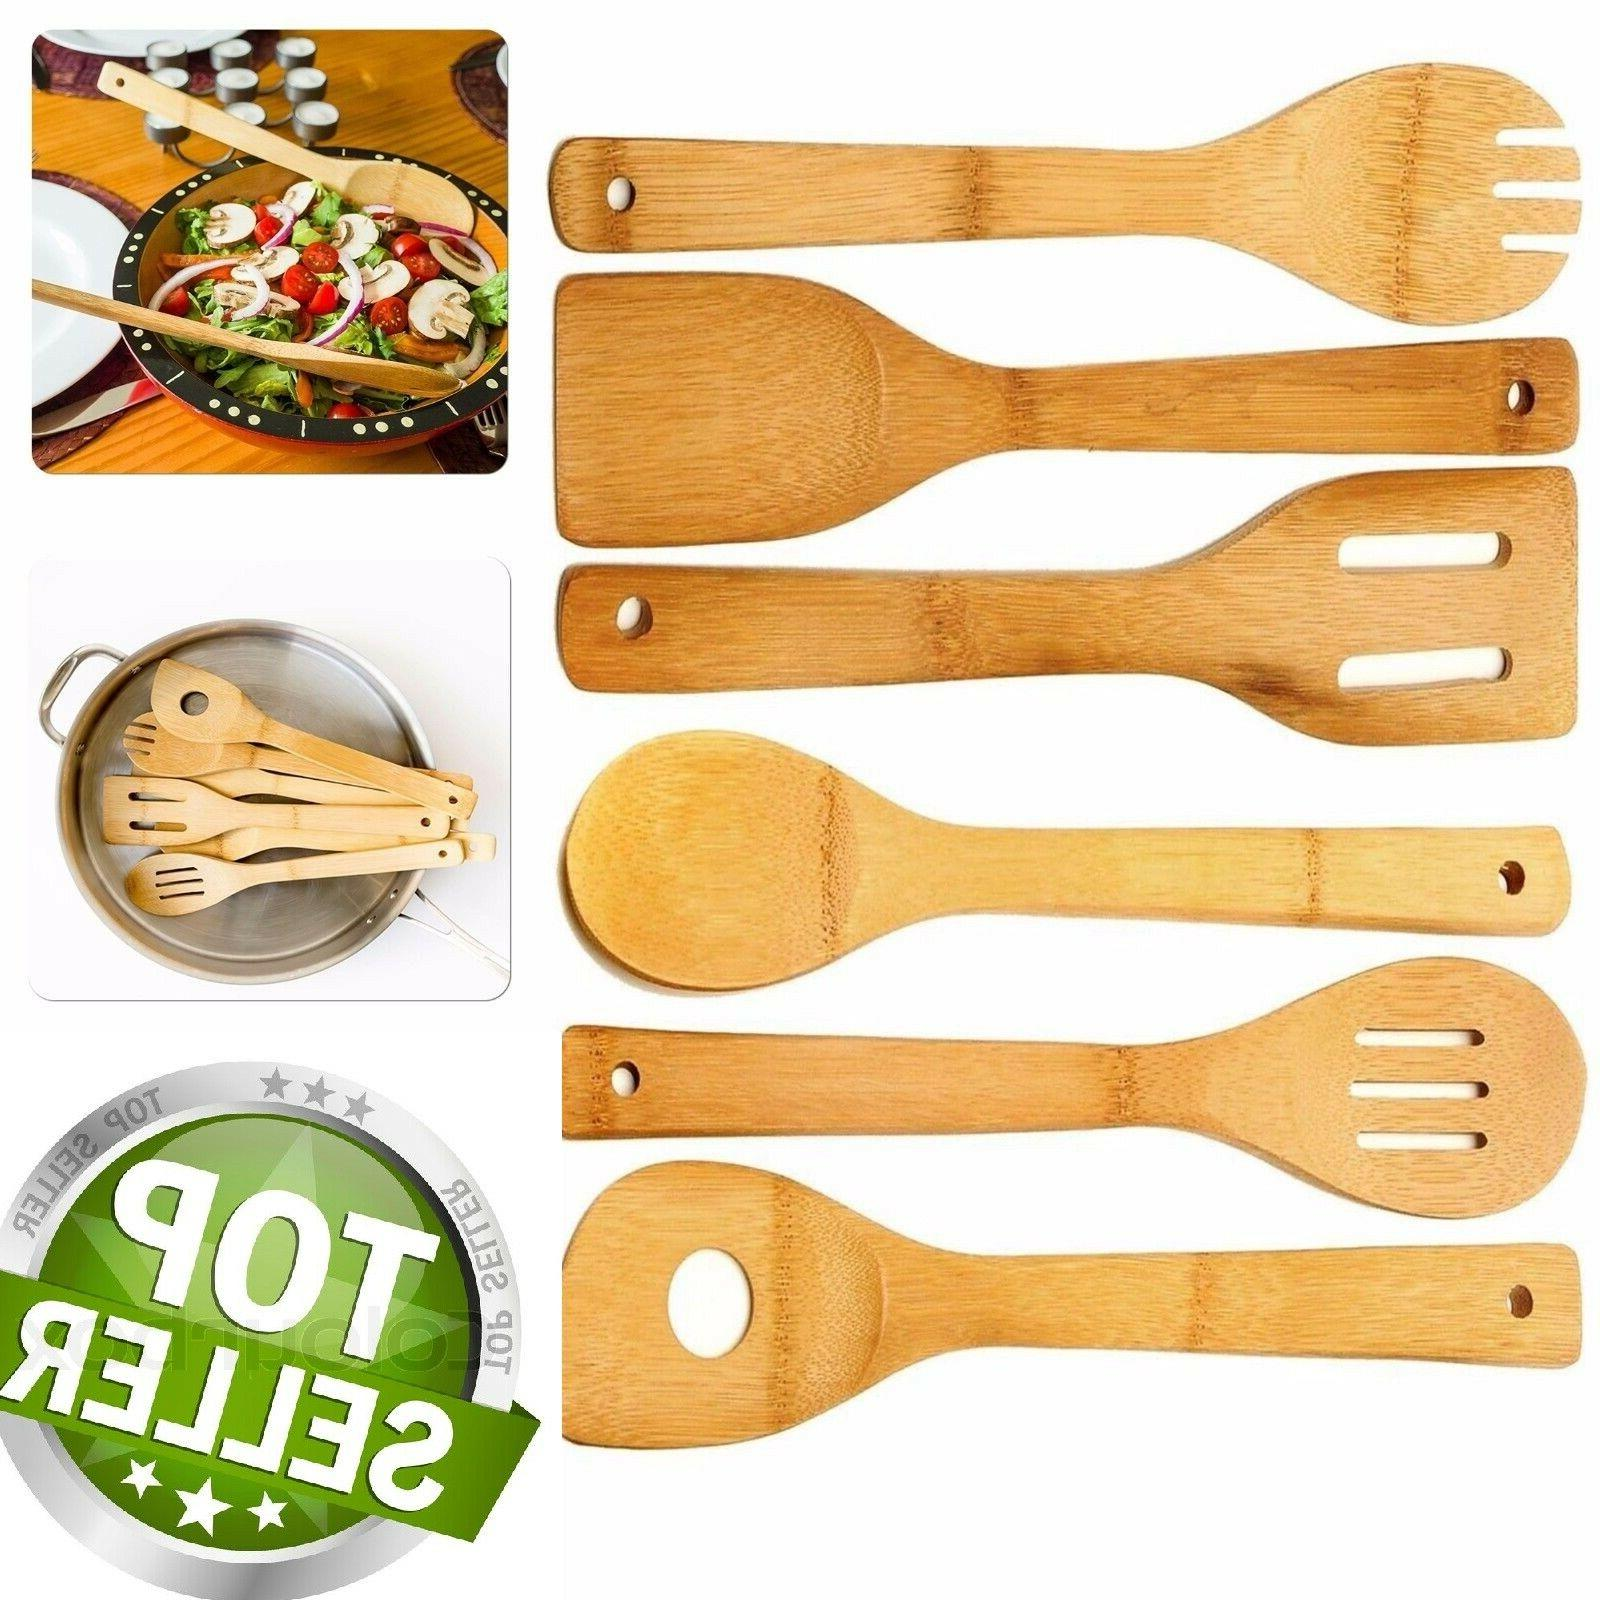 6 piece wooden cooking utensil set bamboo